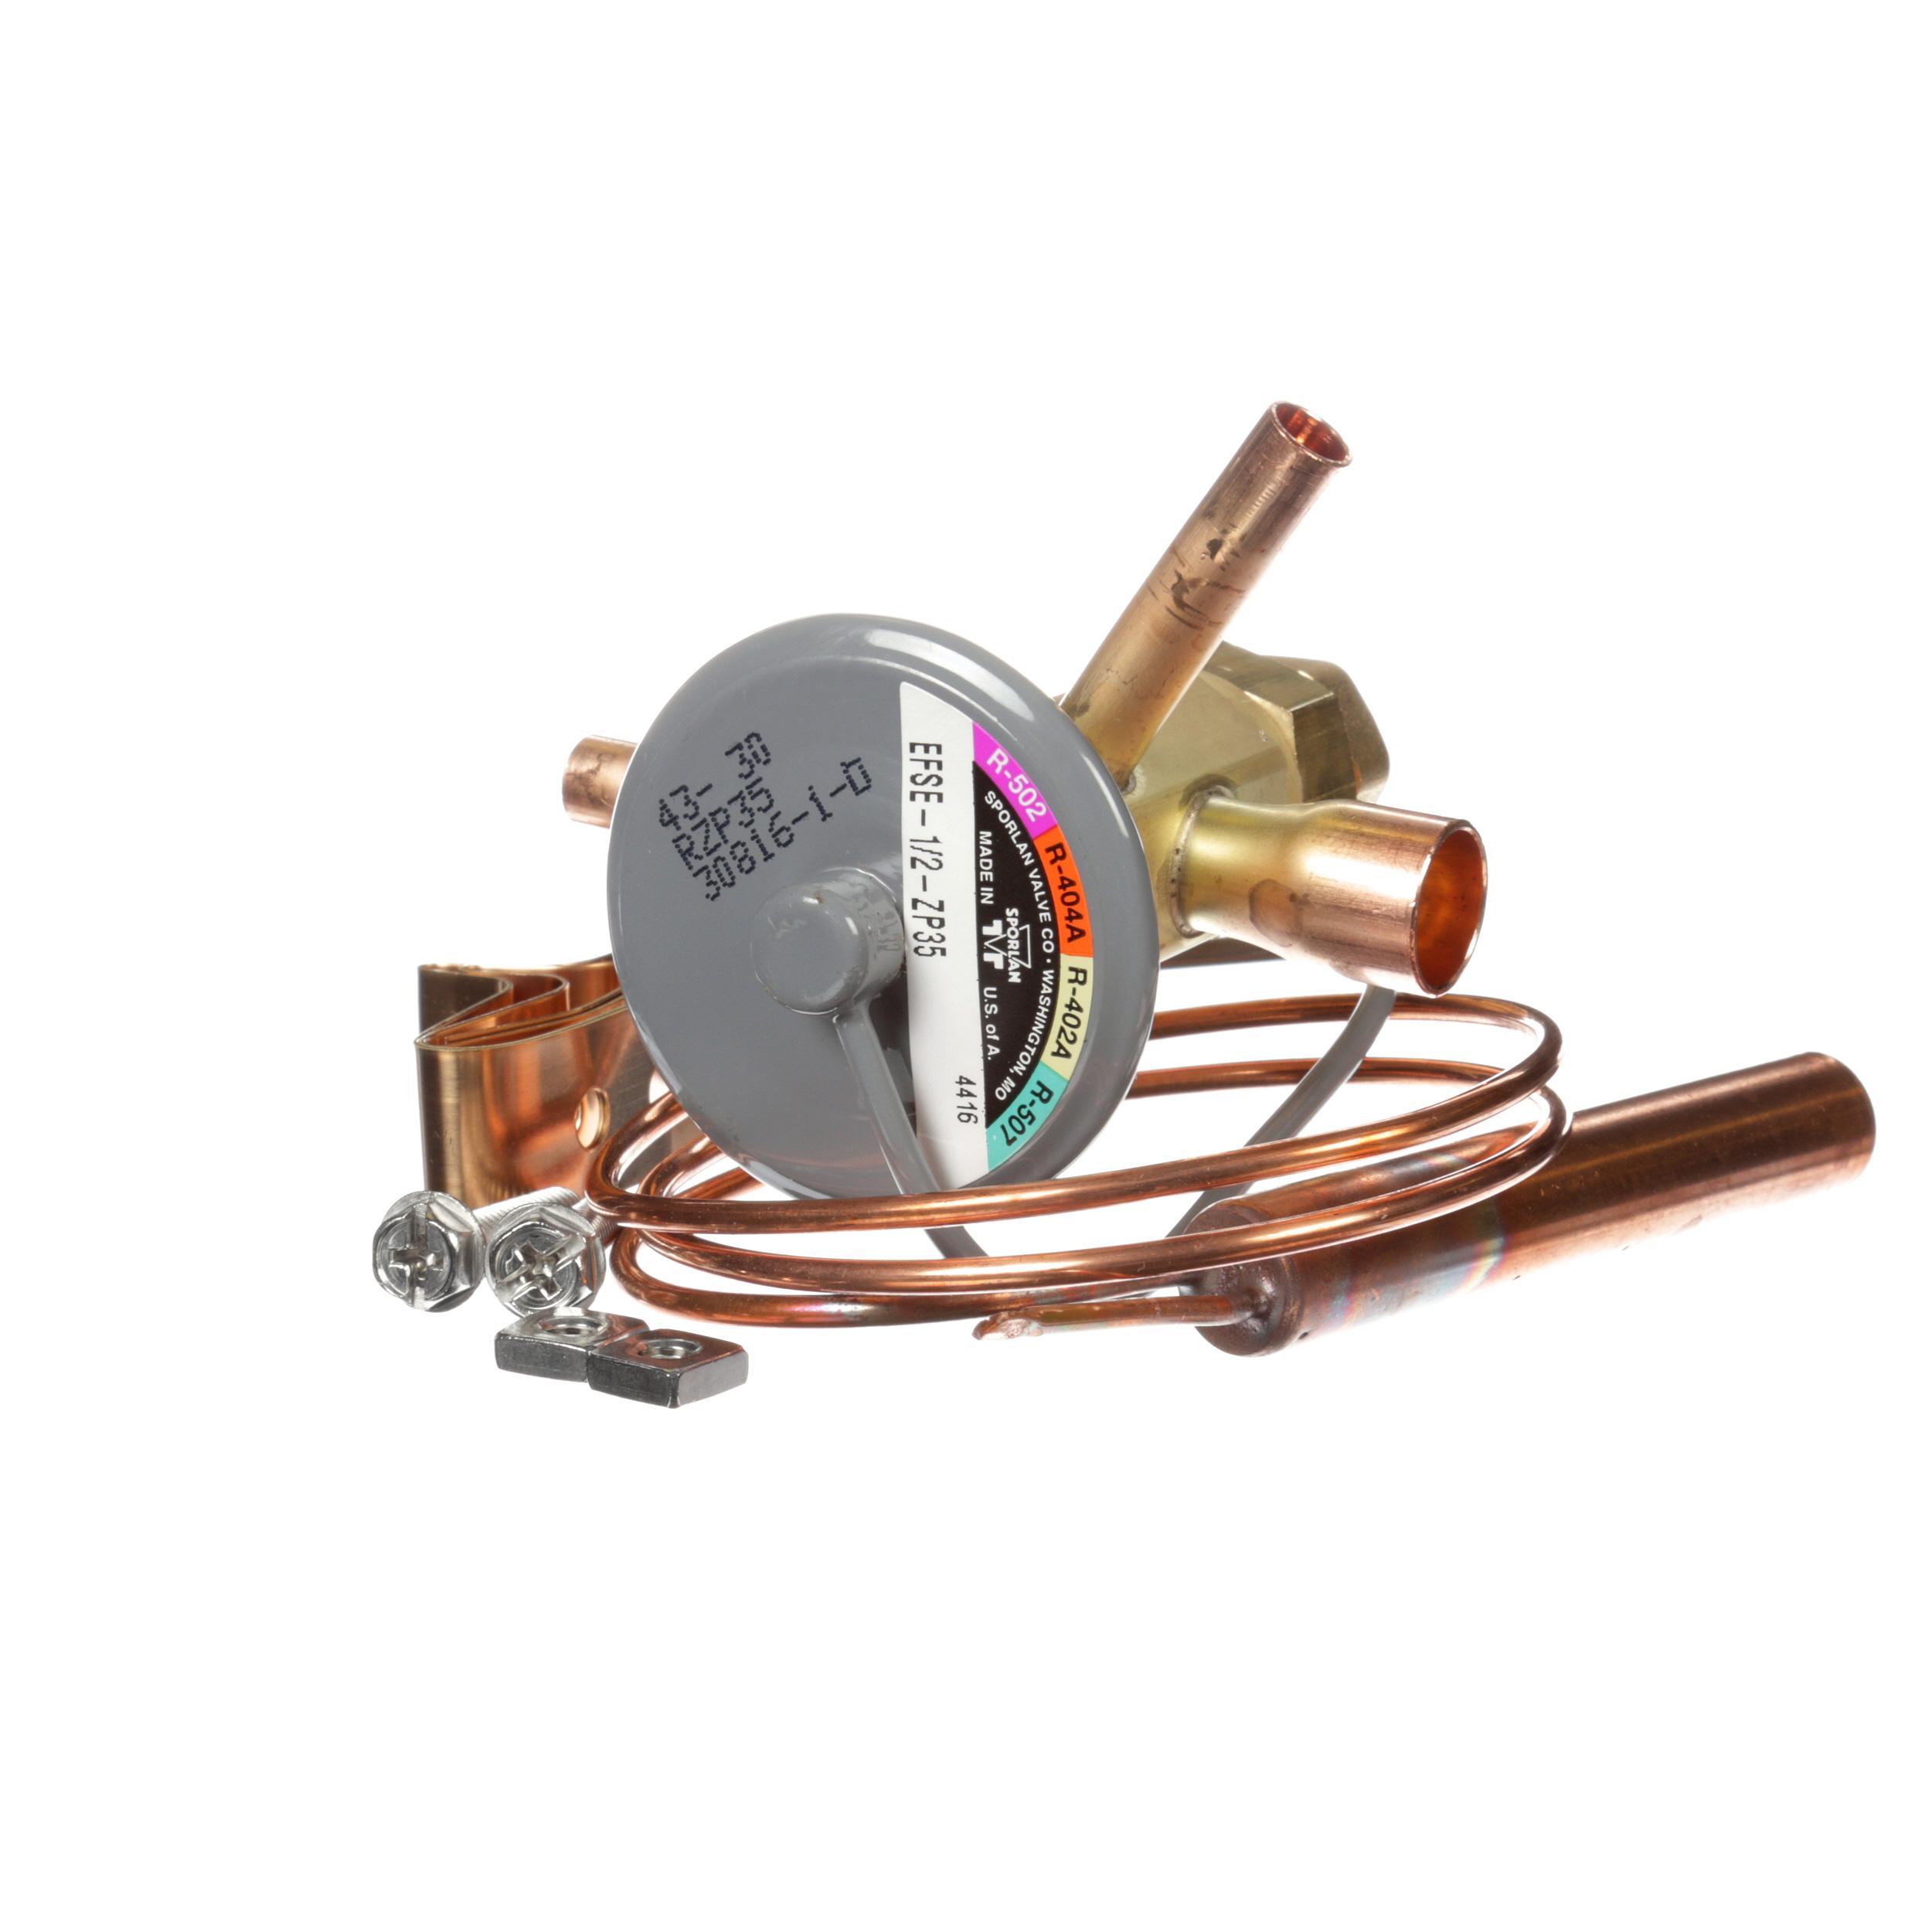 BEVERAGE-AIR EXP VALVE EFSE-1/2-ZP35 13PSI